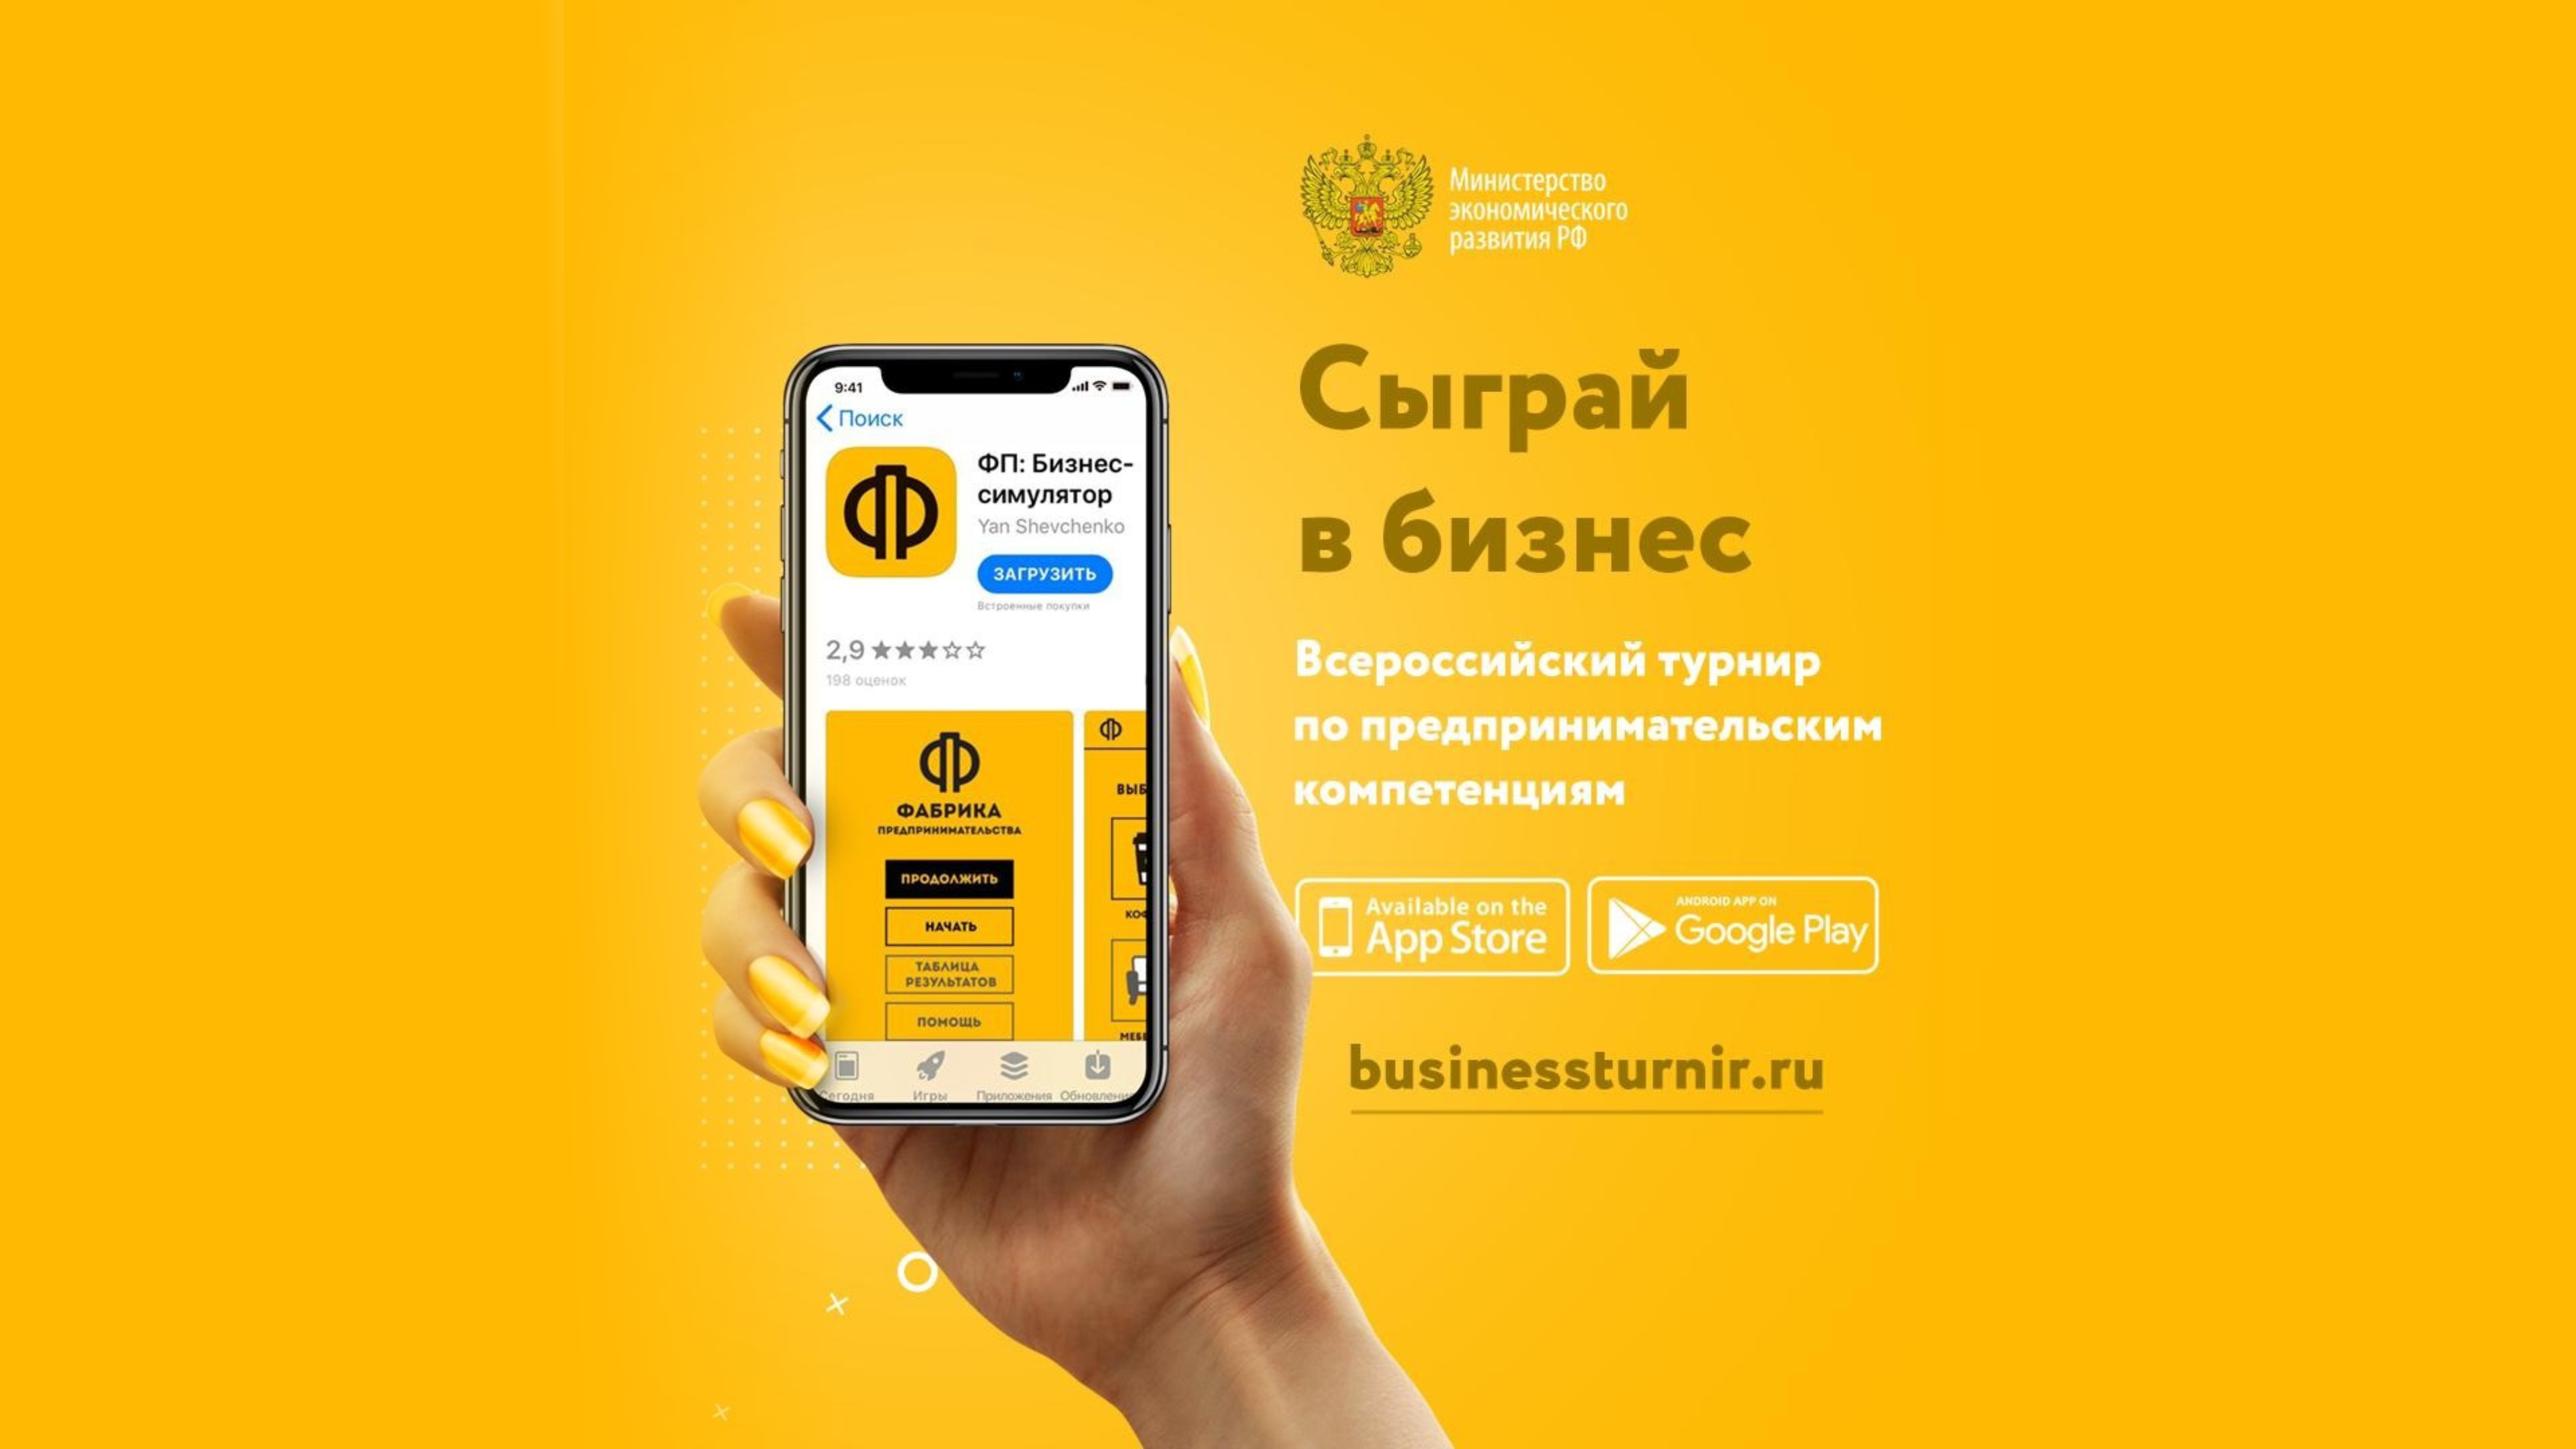 Бизнес- симулятор